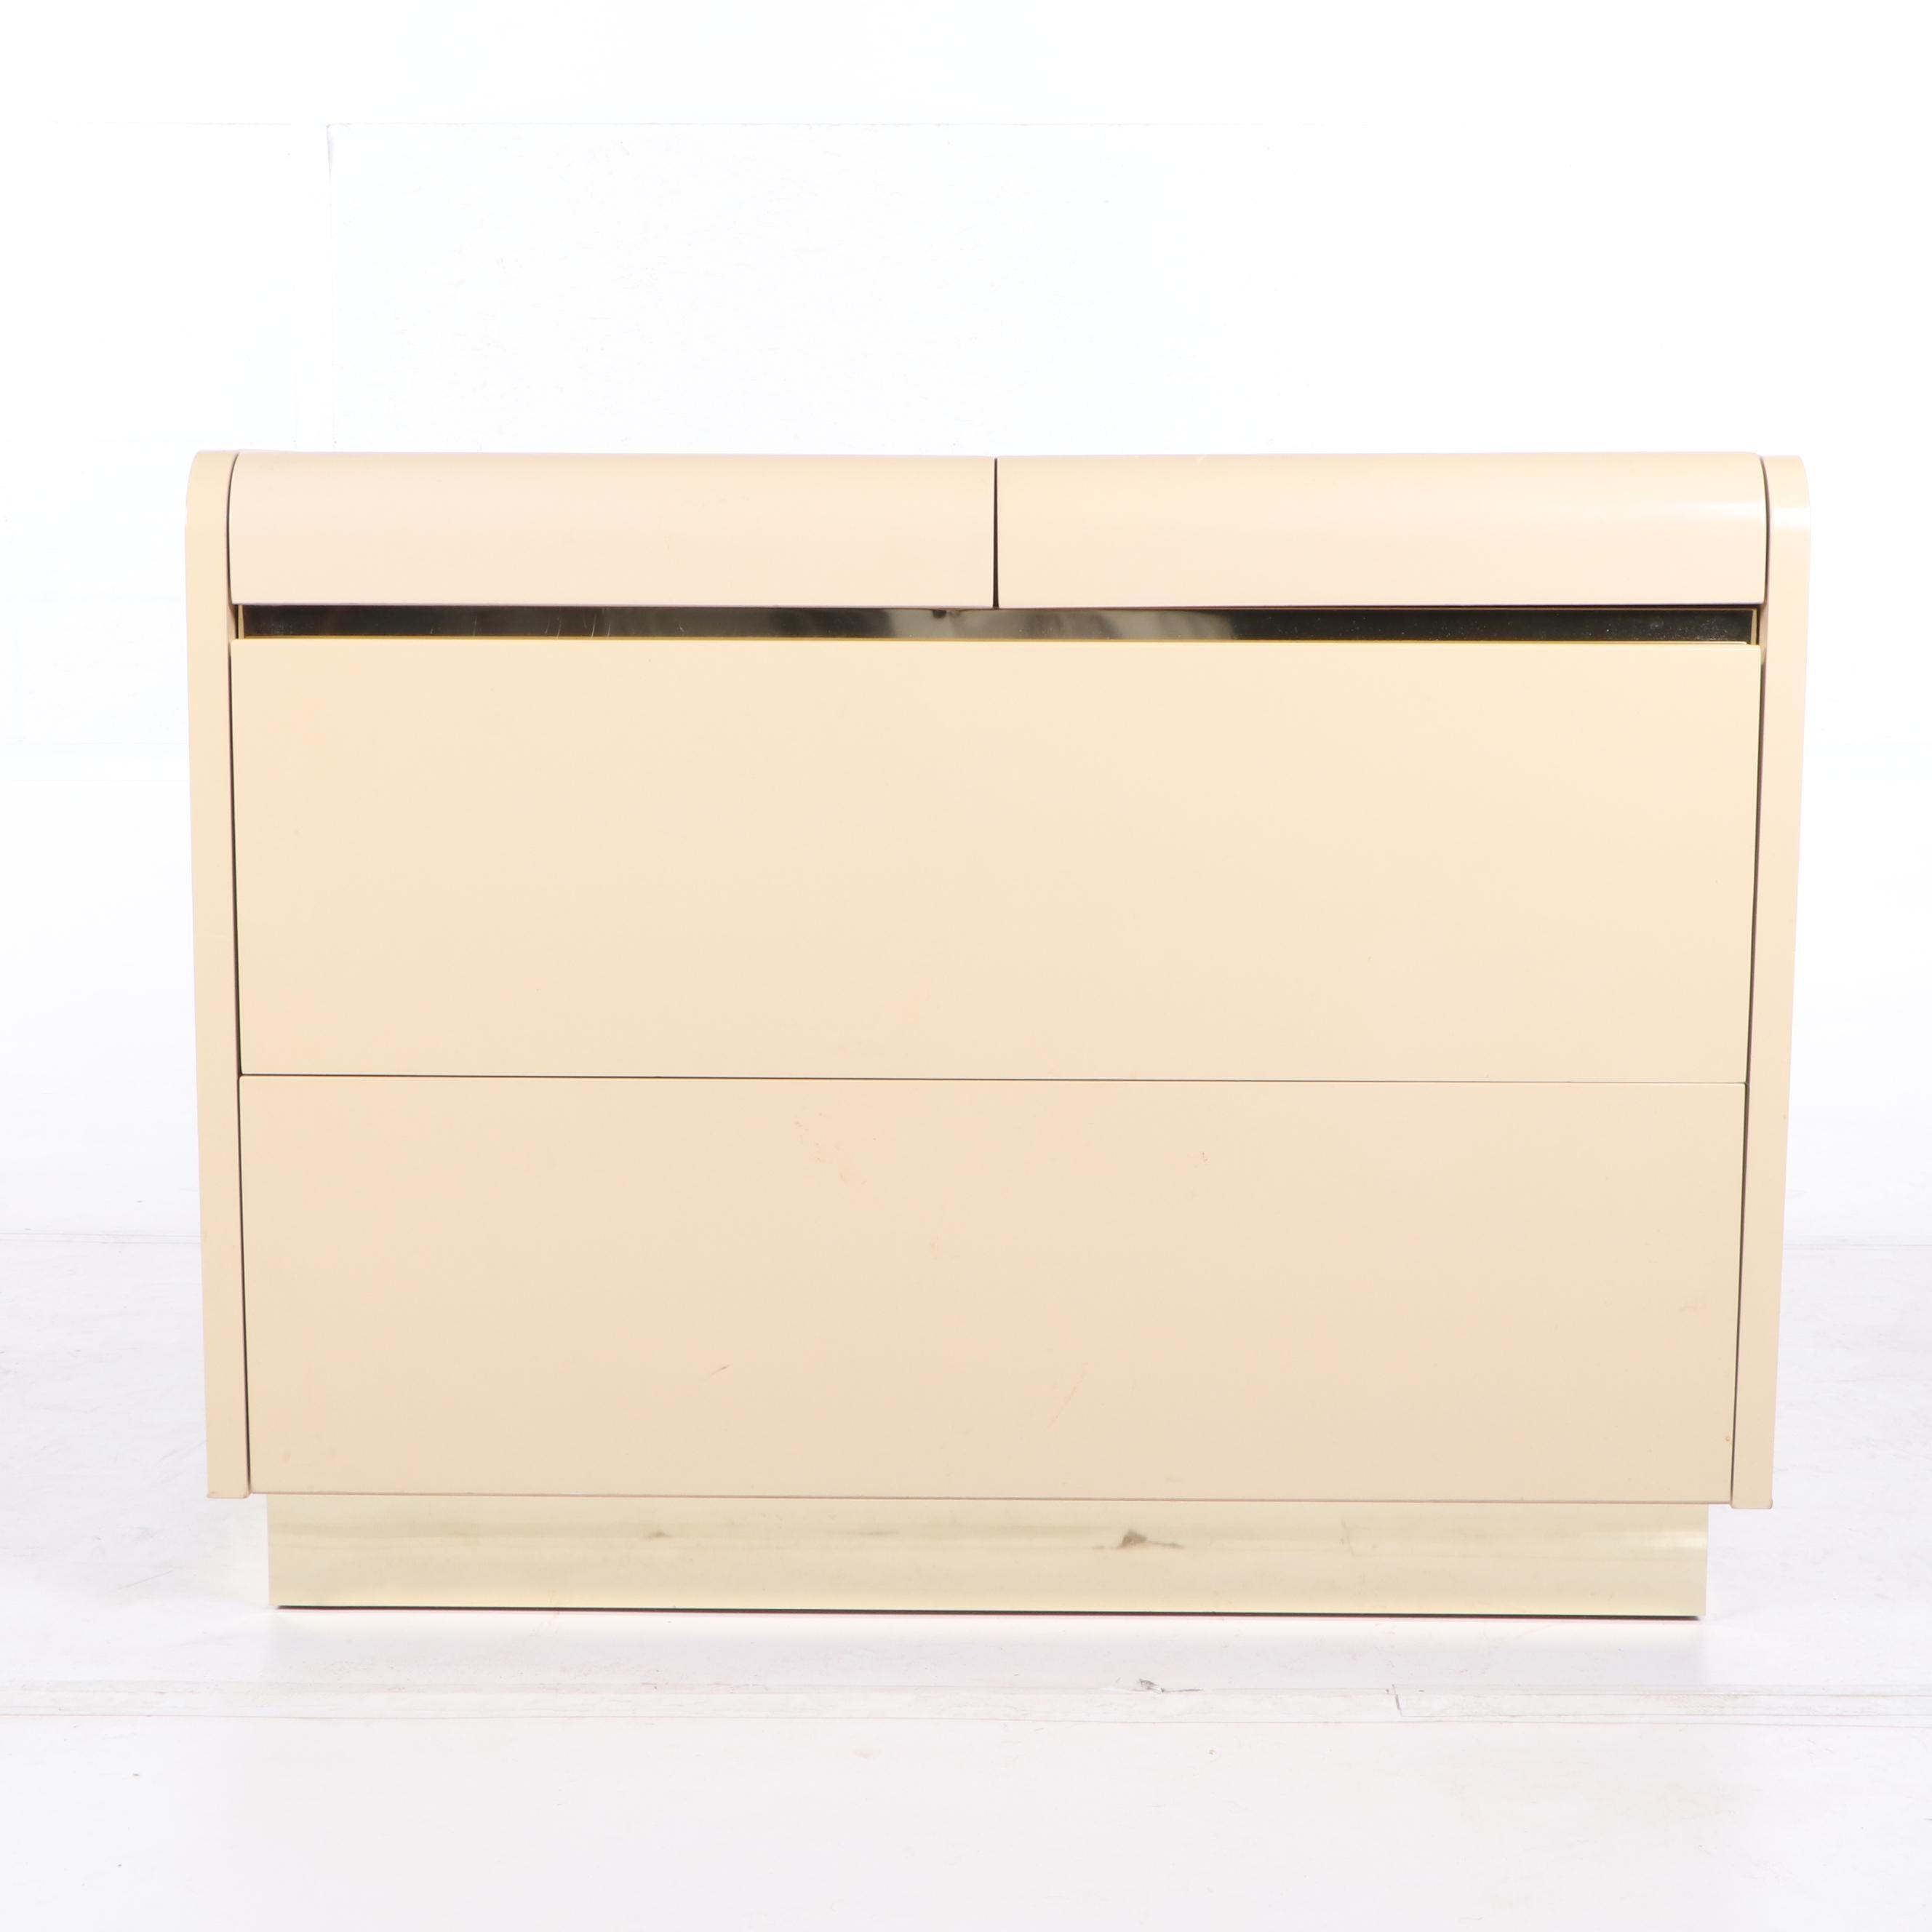 Vintage Lane Lacquer and Brass 4-Drawer Dresser